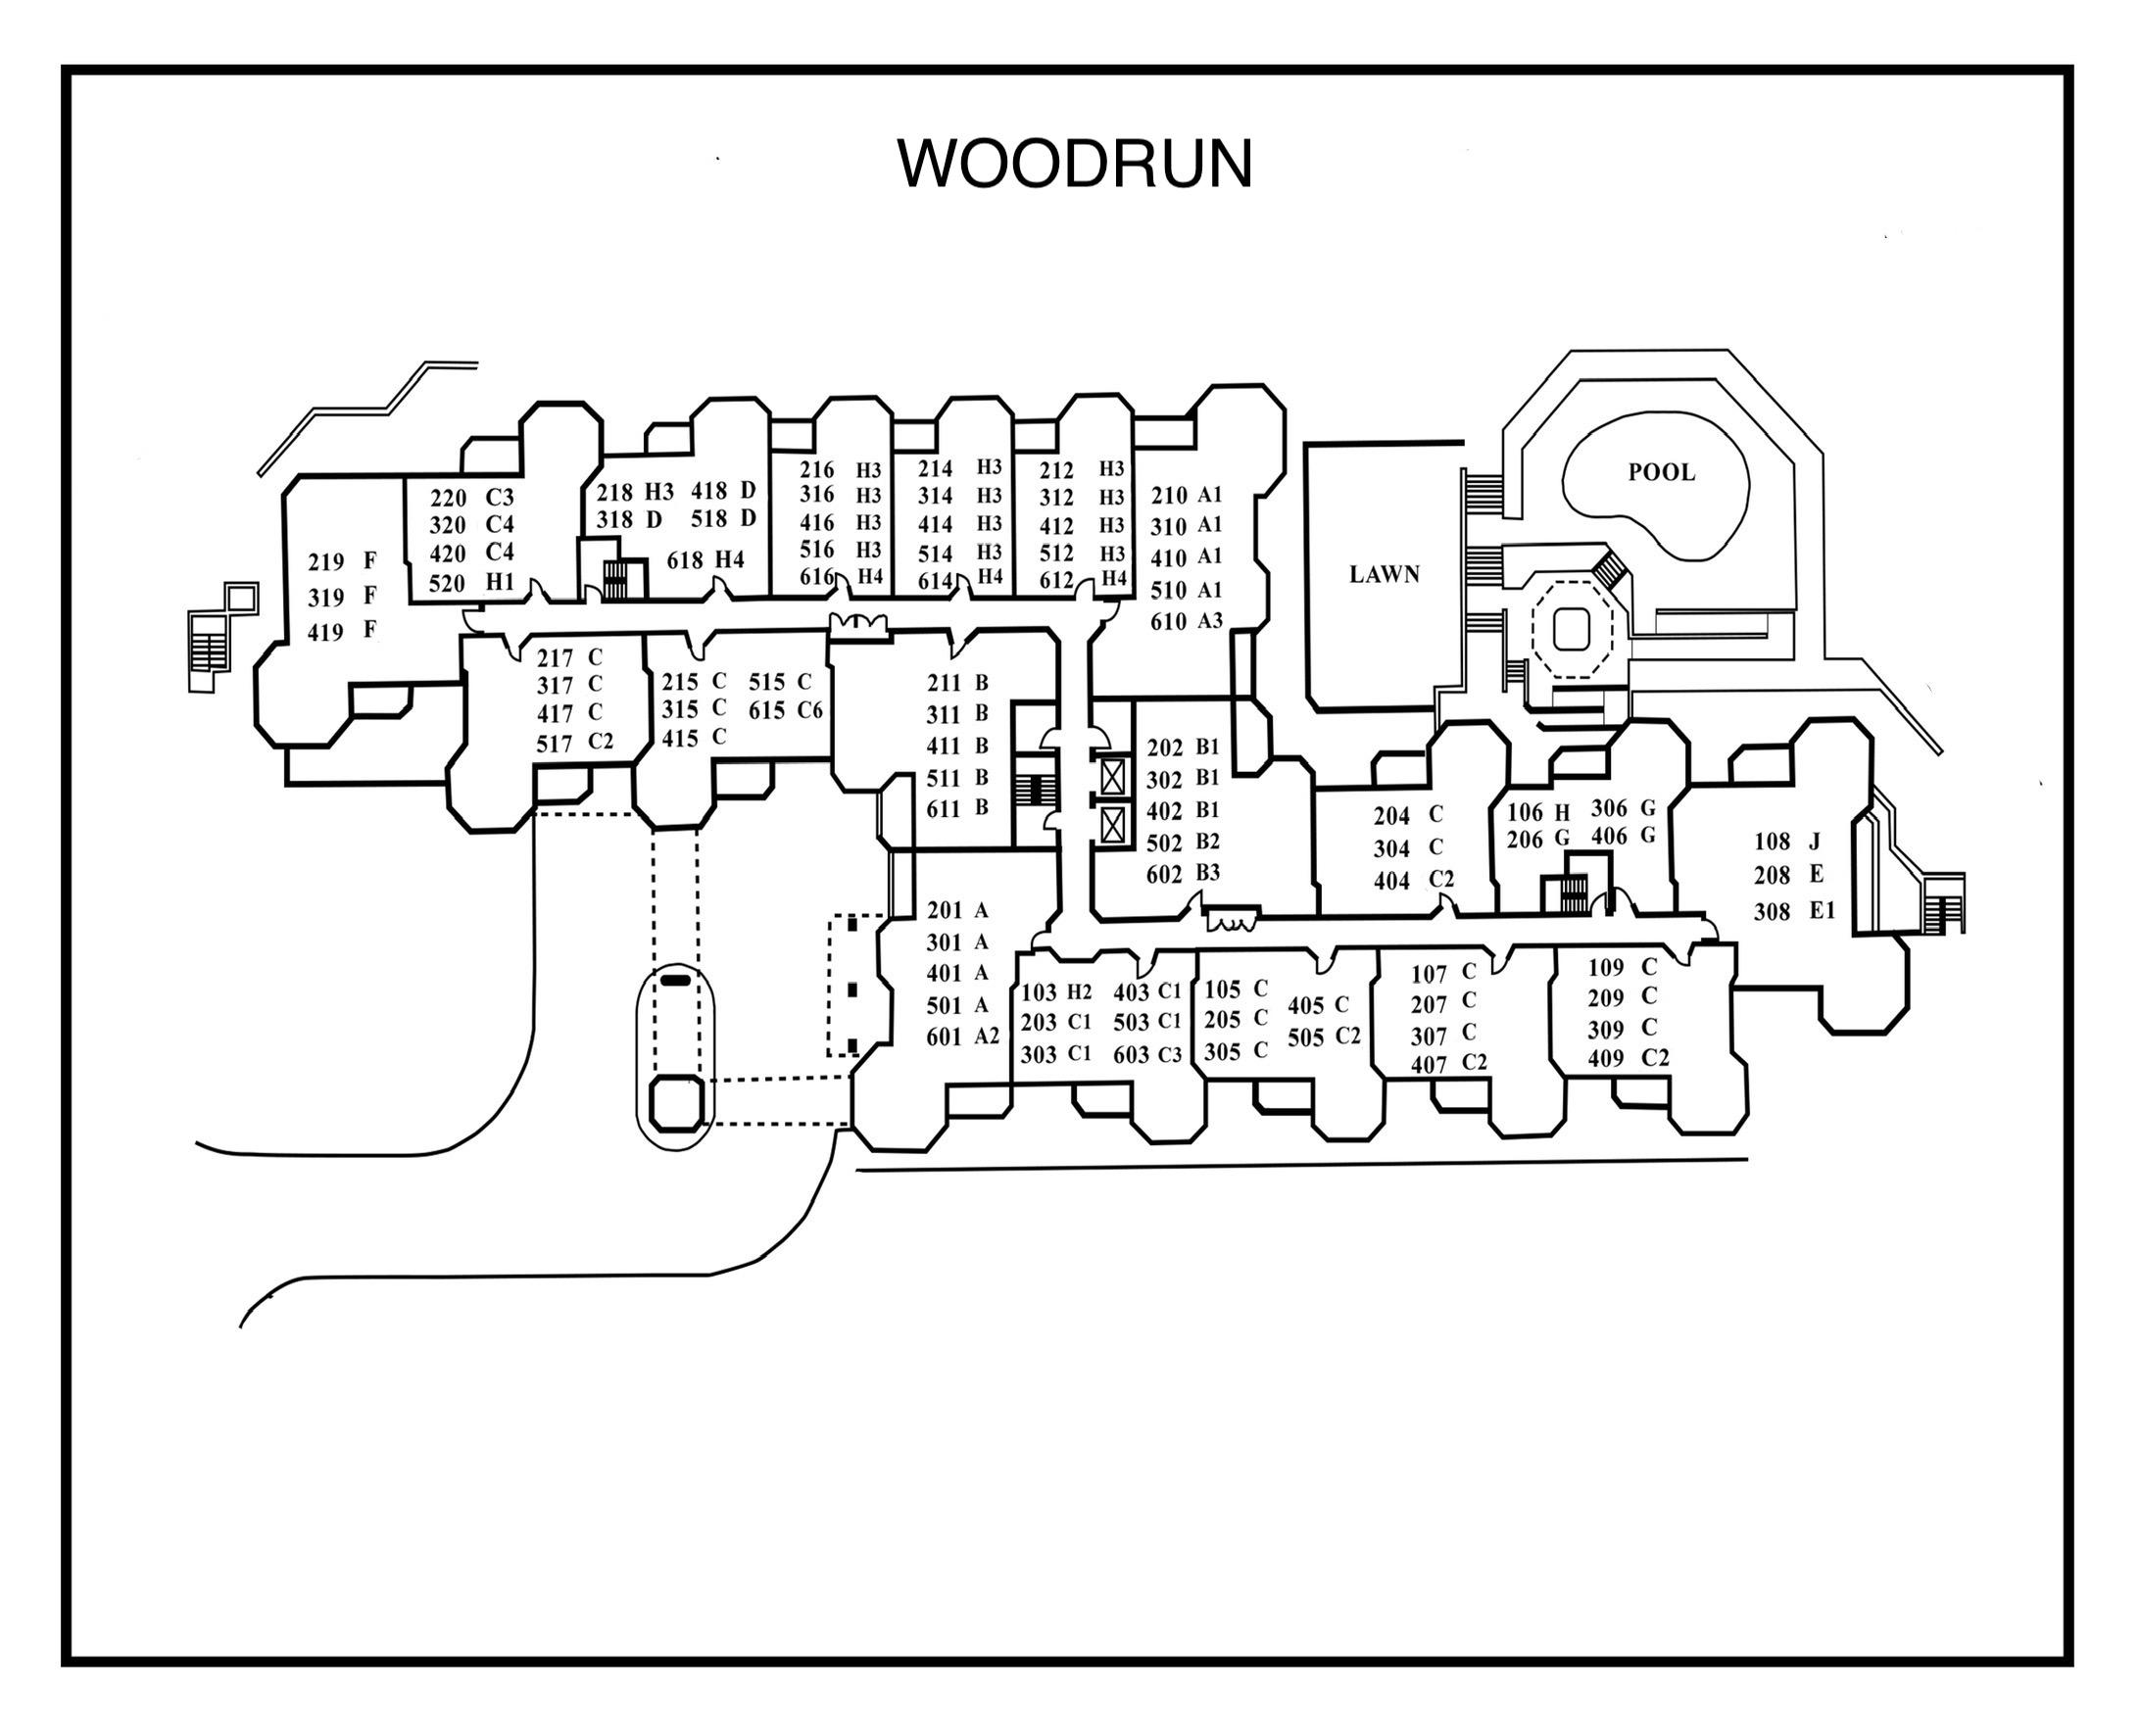 Woodrun unit type directory ready to upload